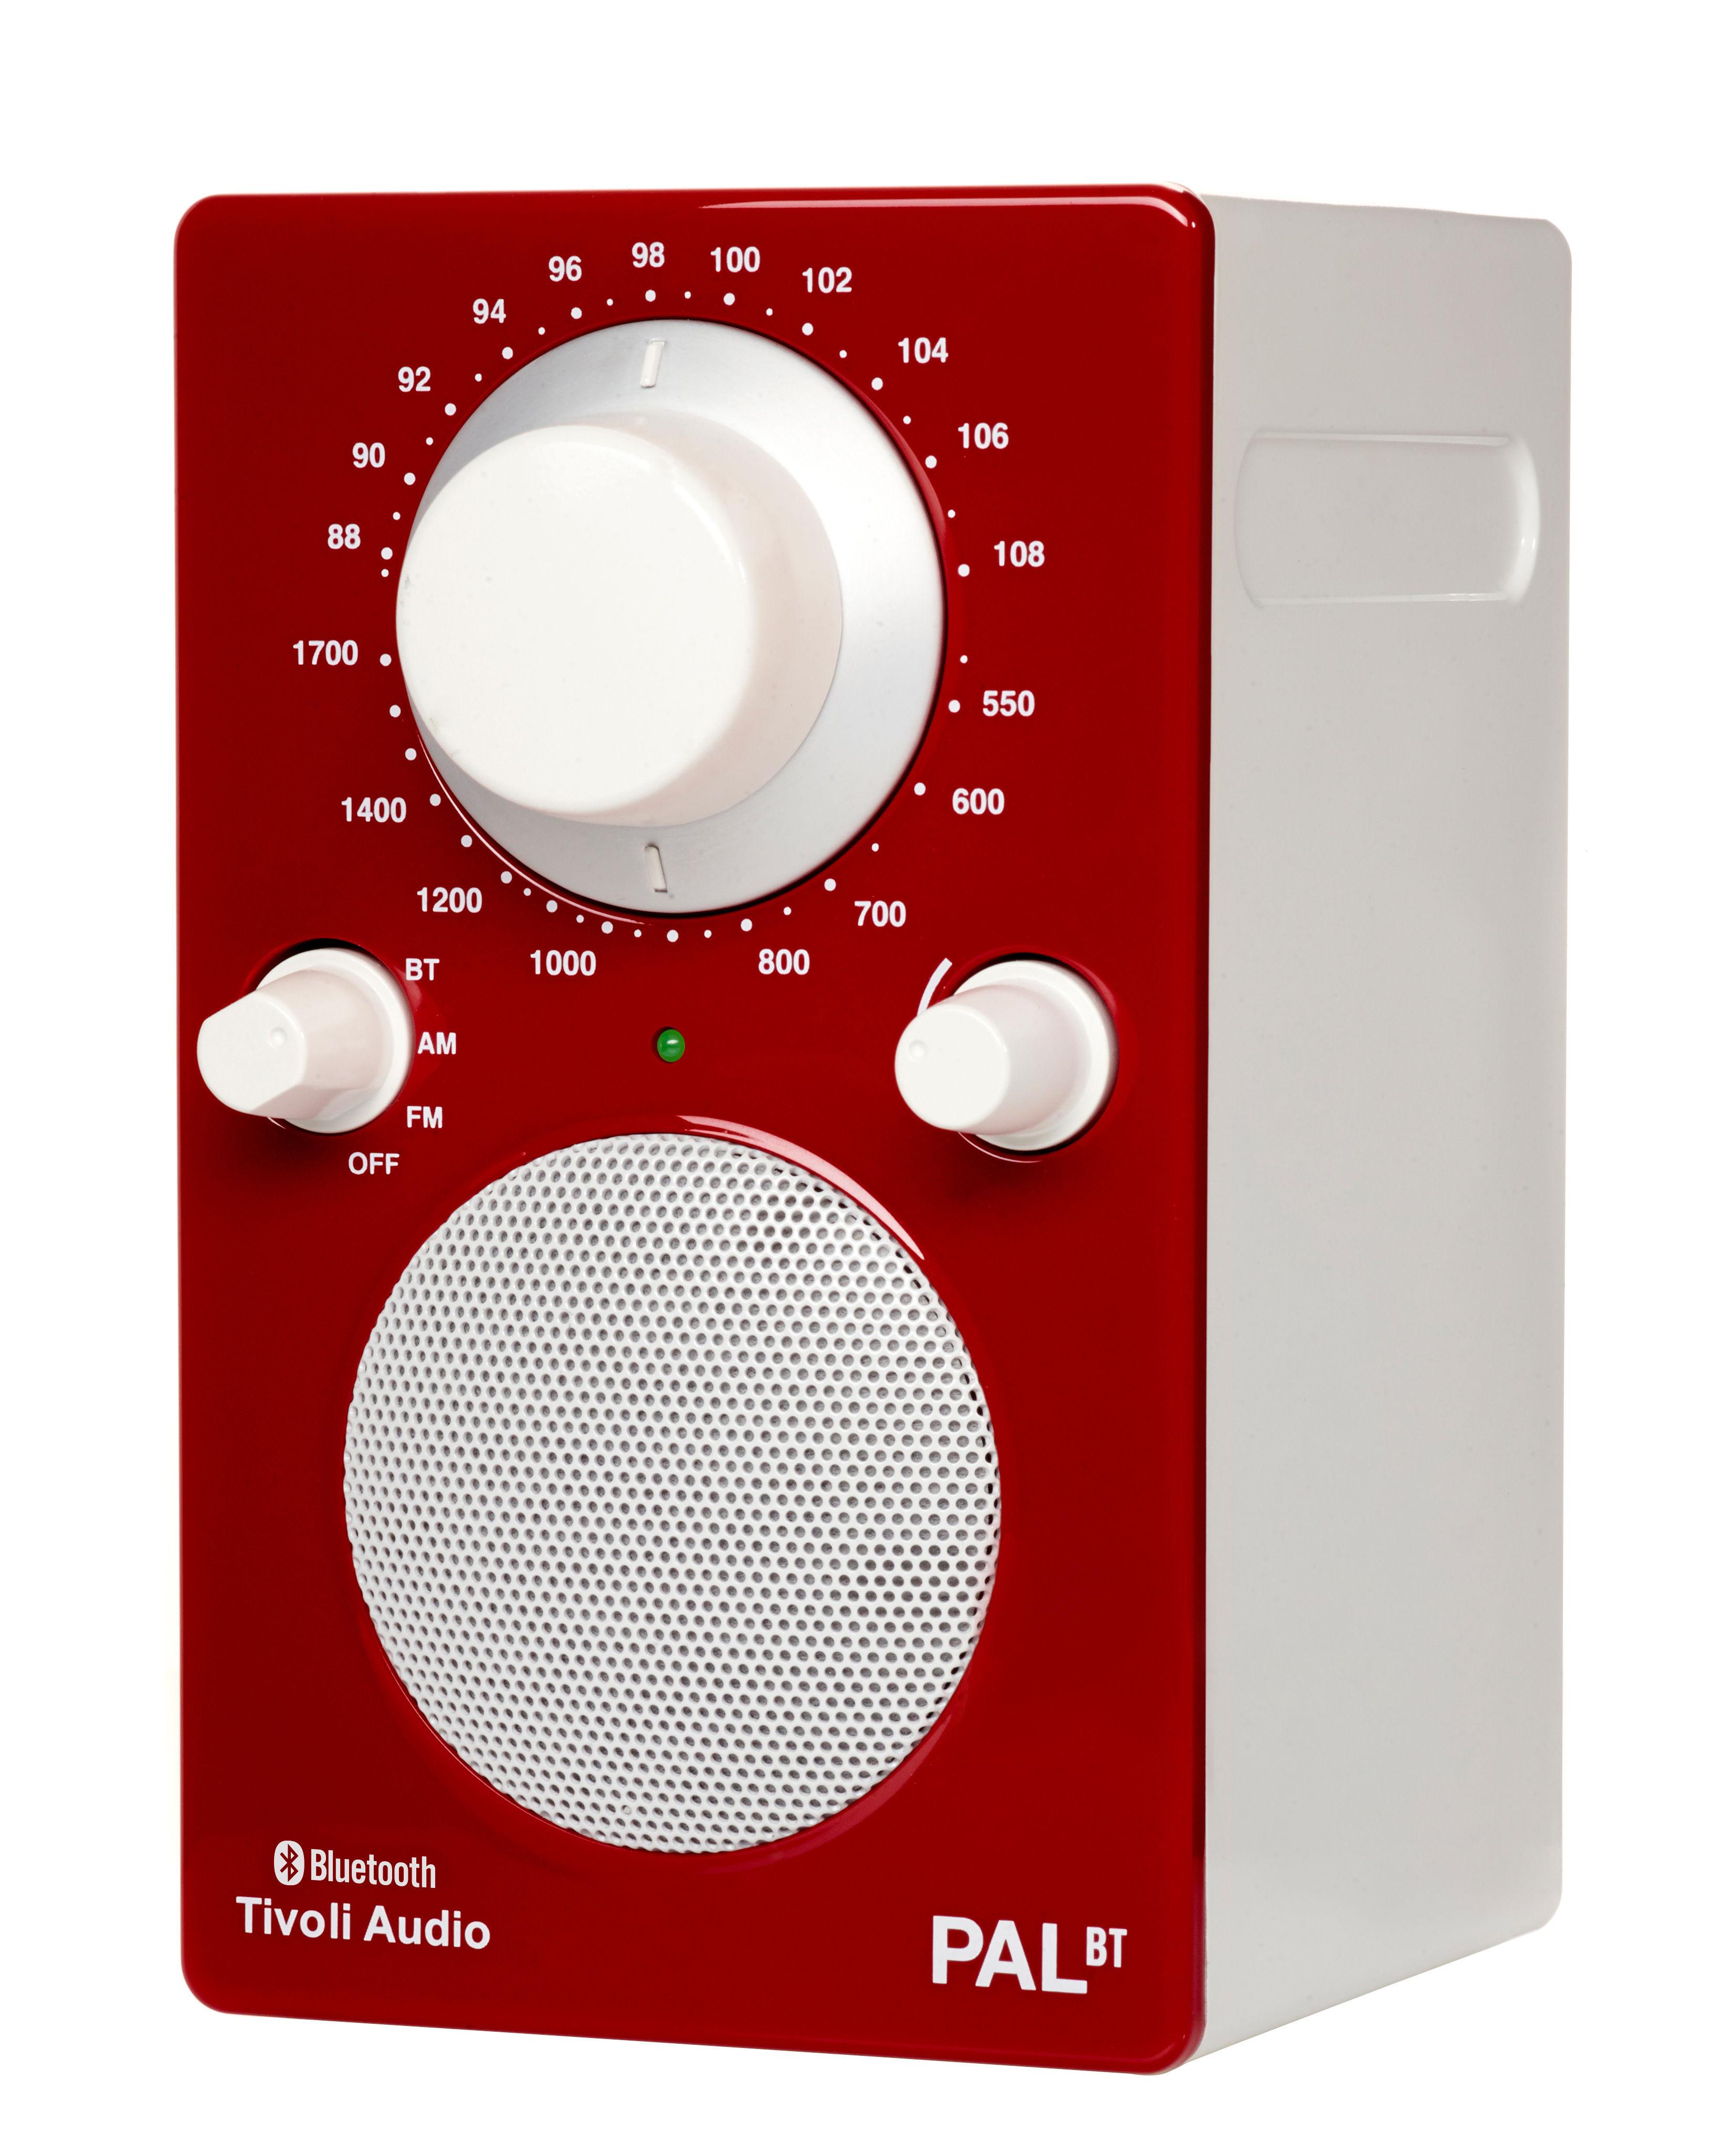 radio pal bt enceinte portative bluetooth rouge blanc tivoli audio. Black Bedroom Furniture Sets. Home Design Ideas